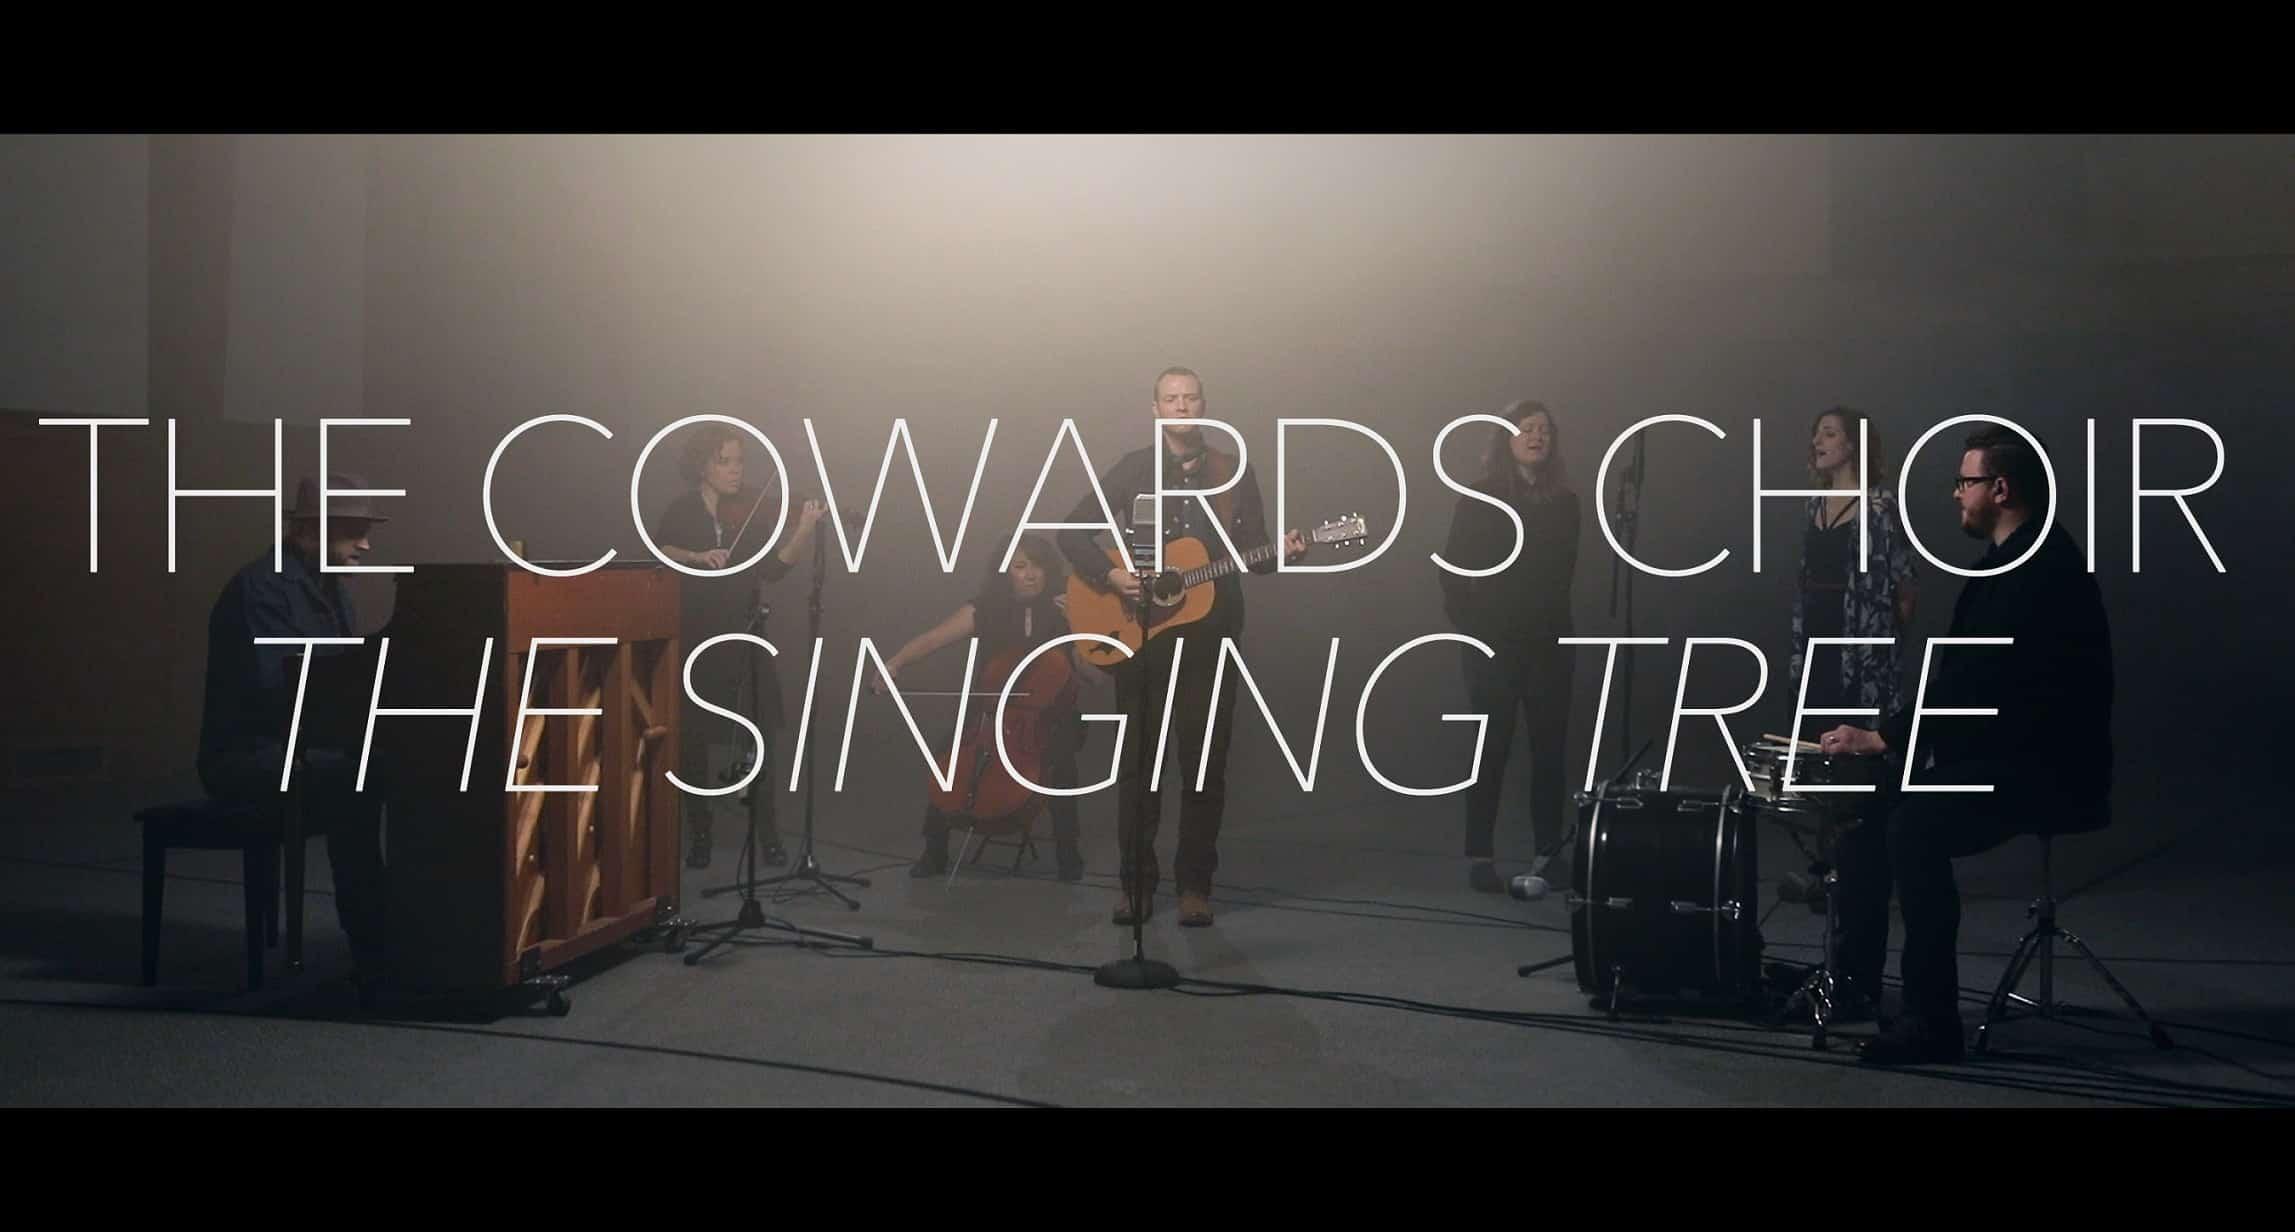 Cowards Choir - The Singing Tree © 2017